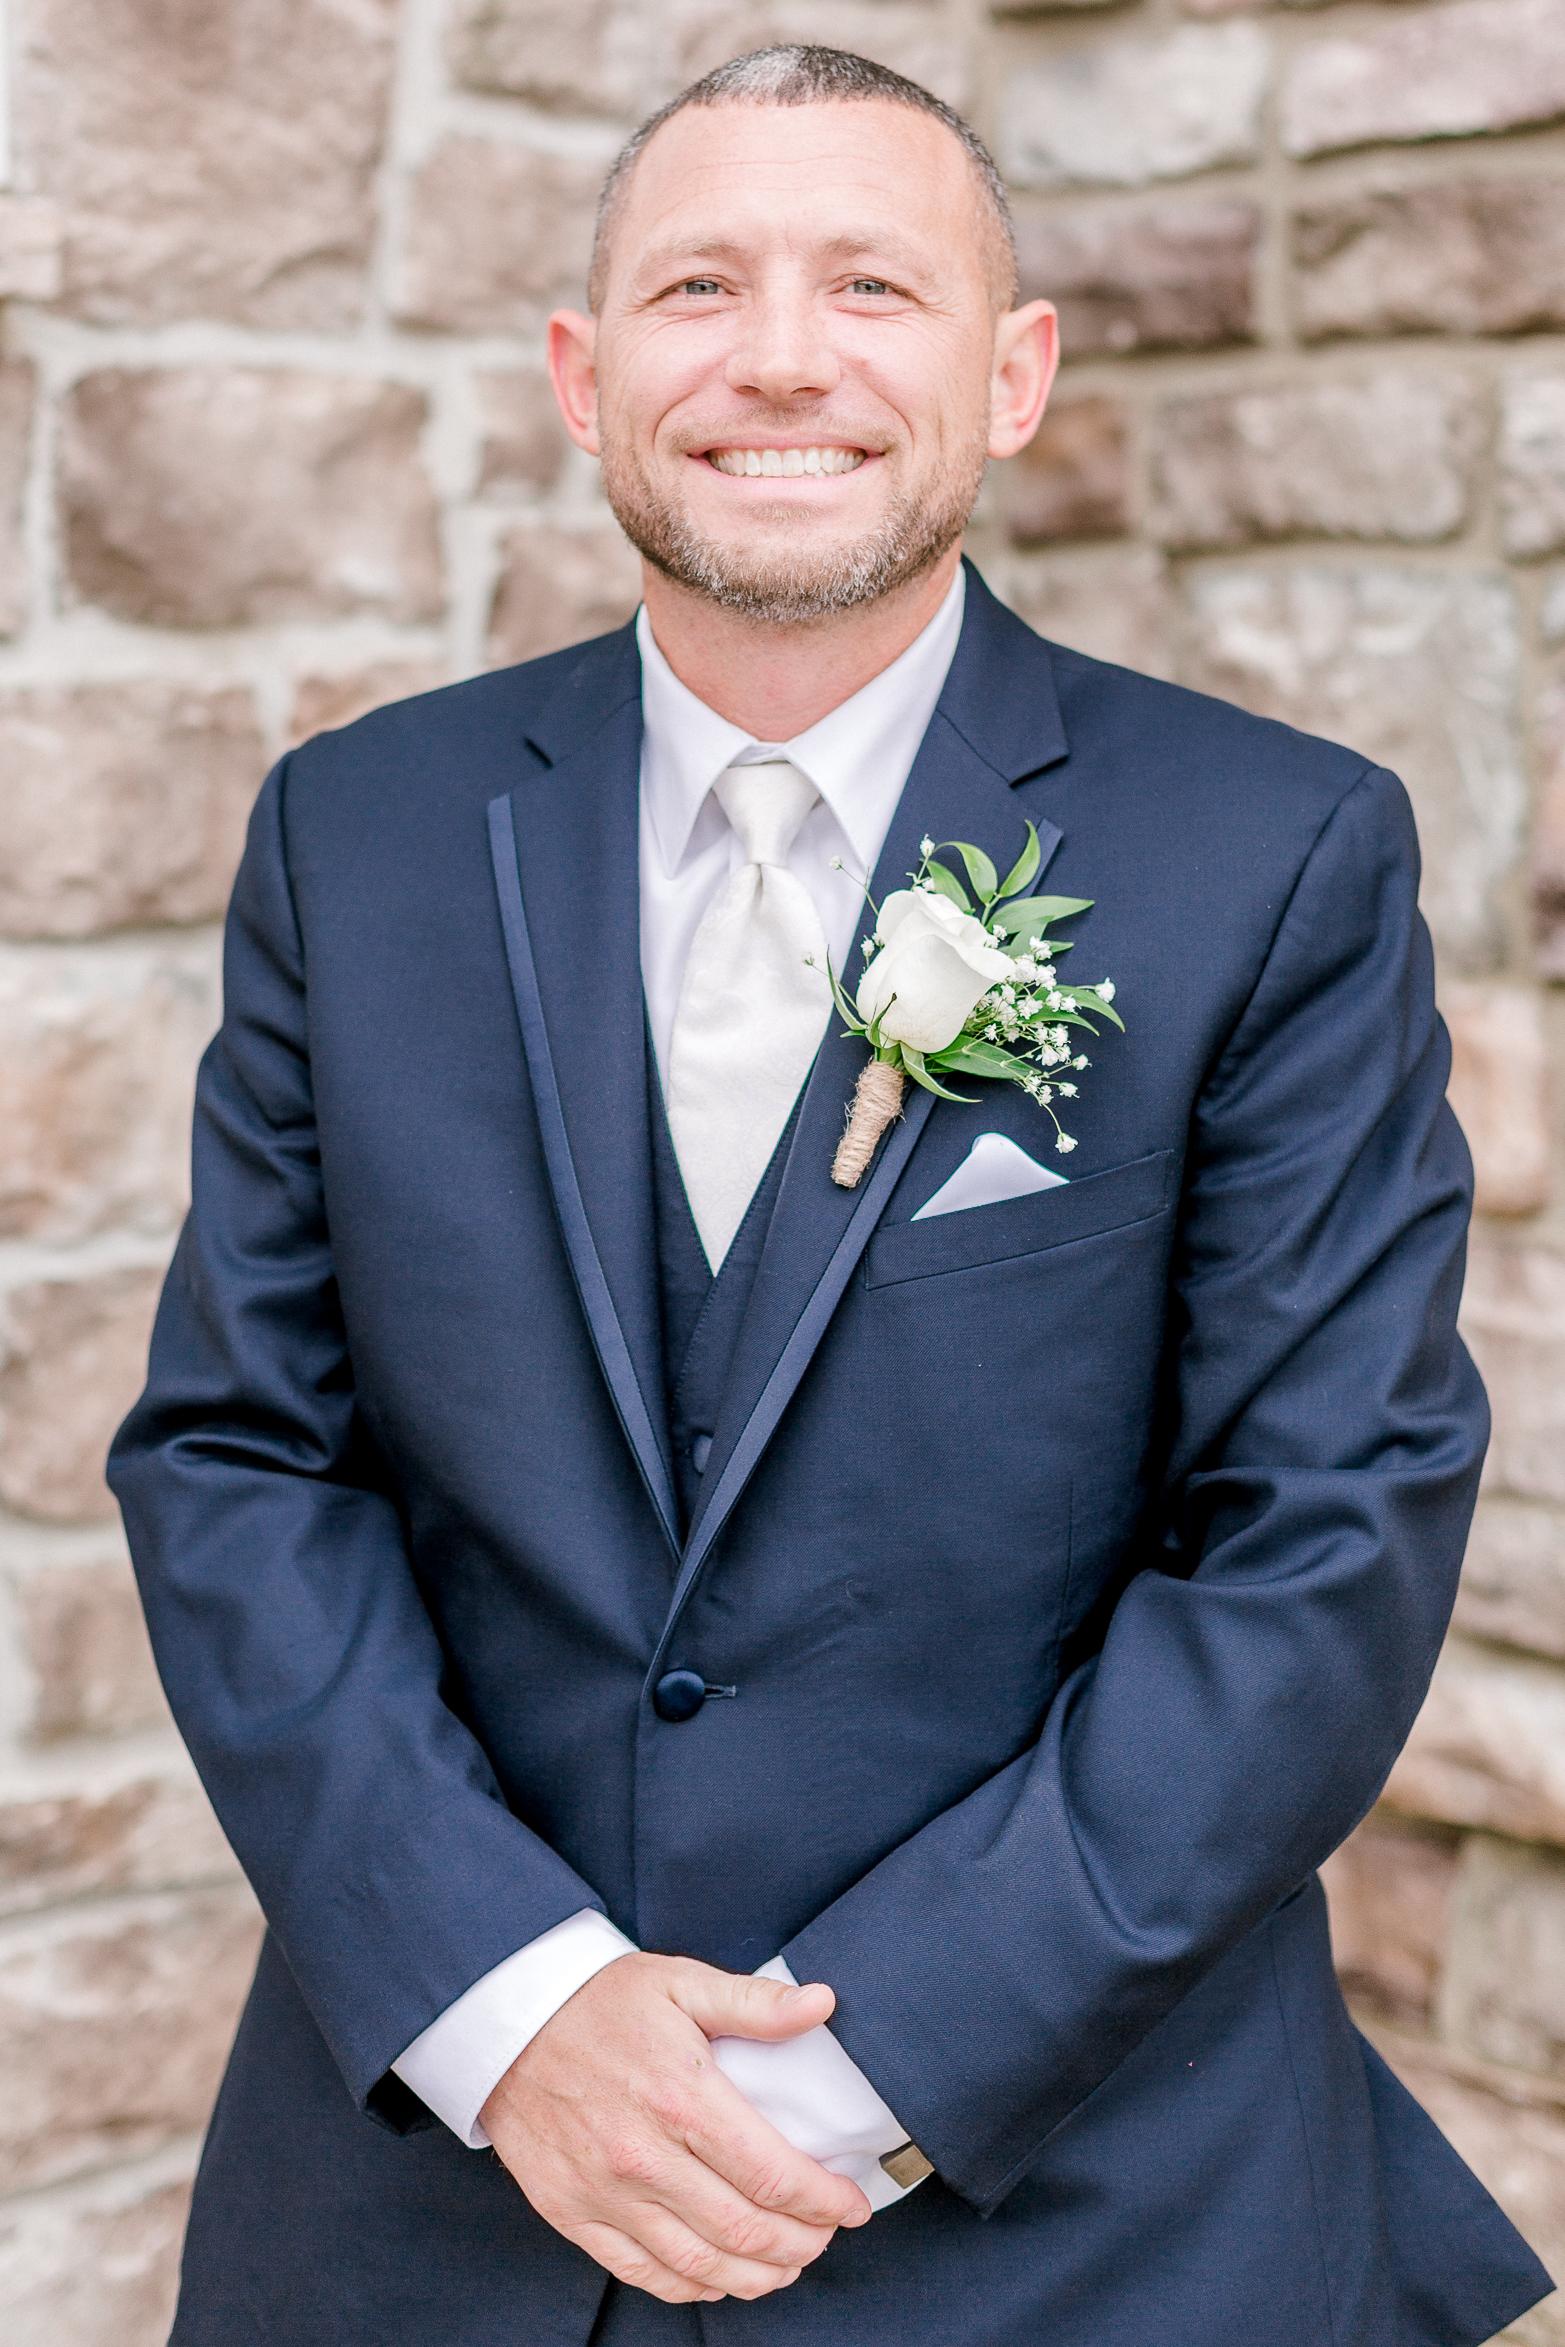 Pennsylvania October Fall Lehigh Valley wedding and lifestyle photographer Lytle Photo Co (1 of 1)-6.jpg